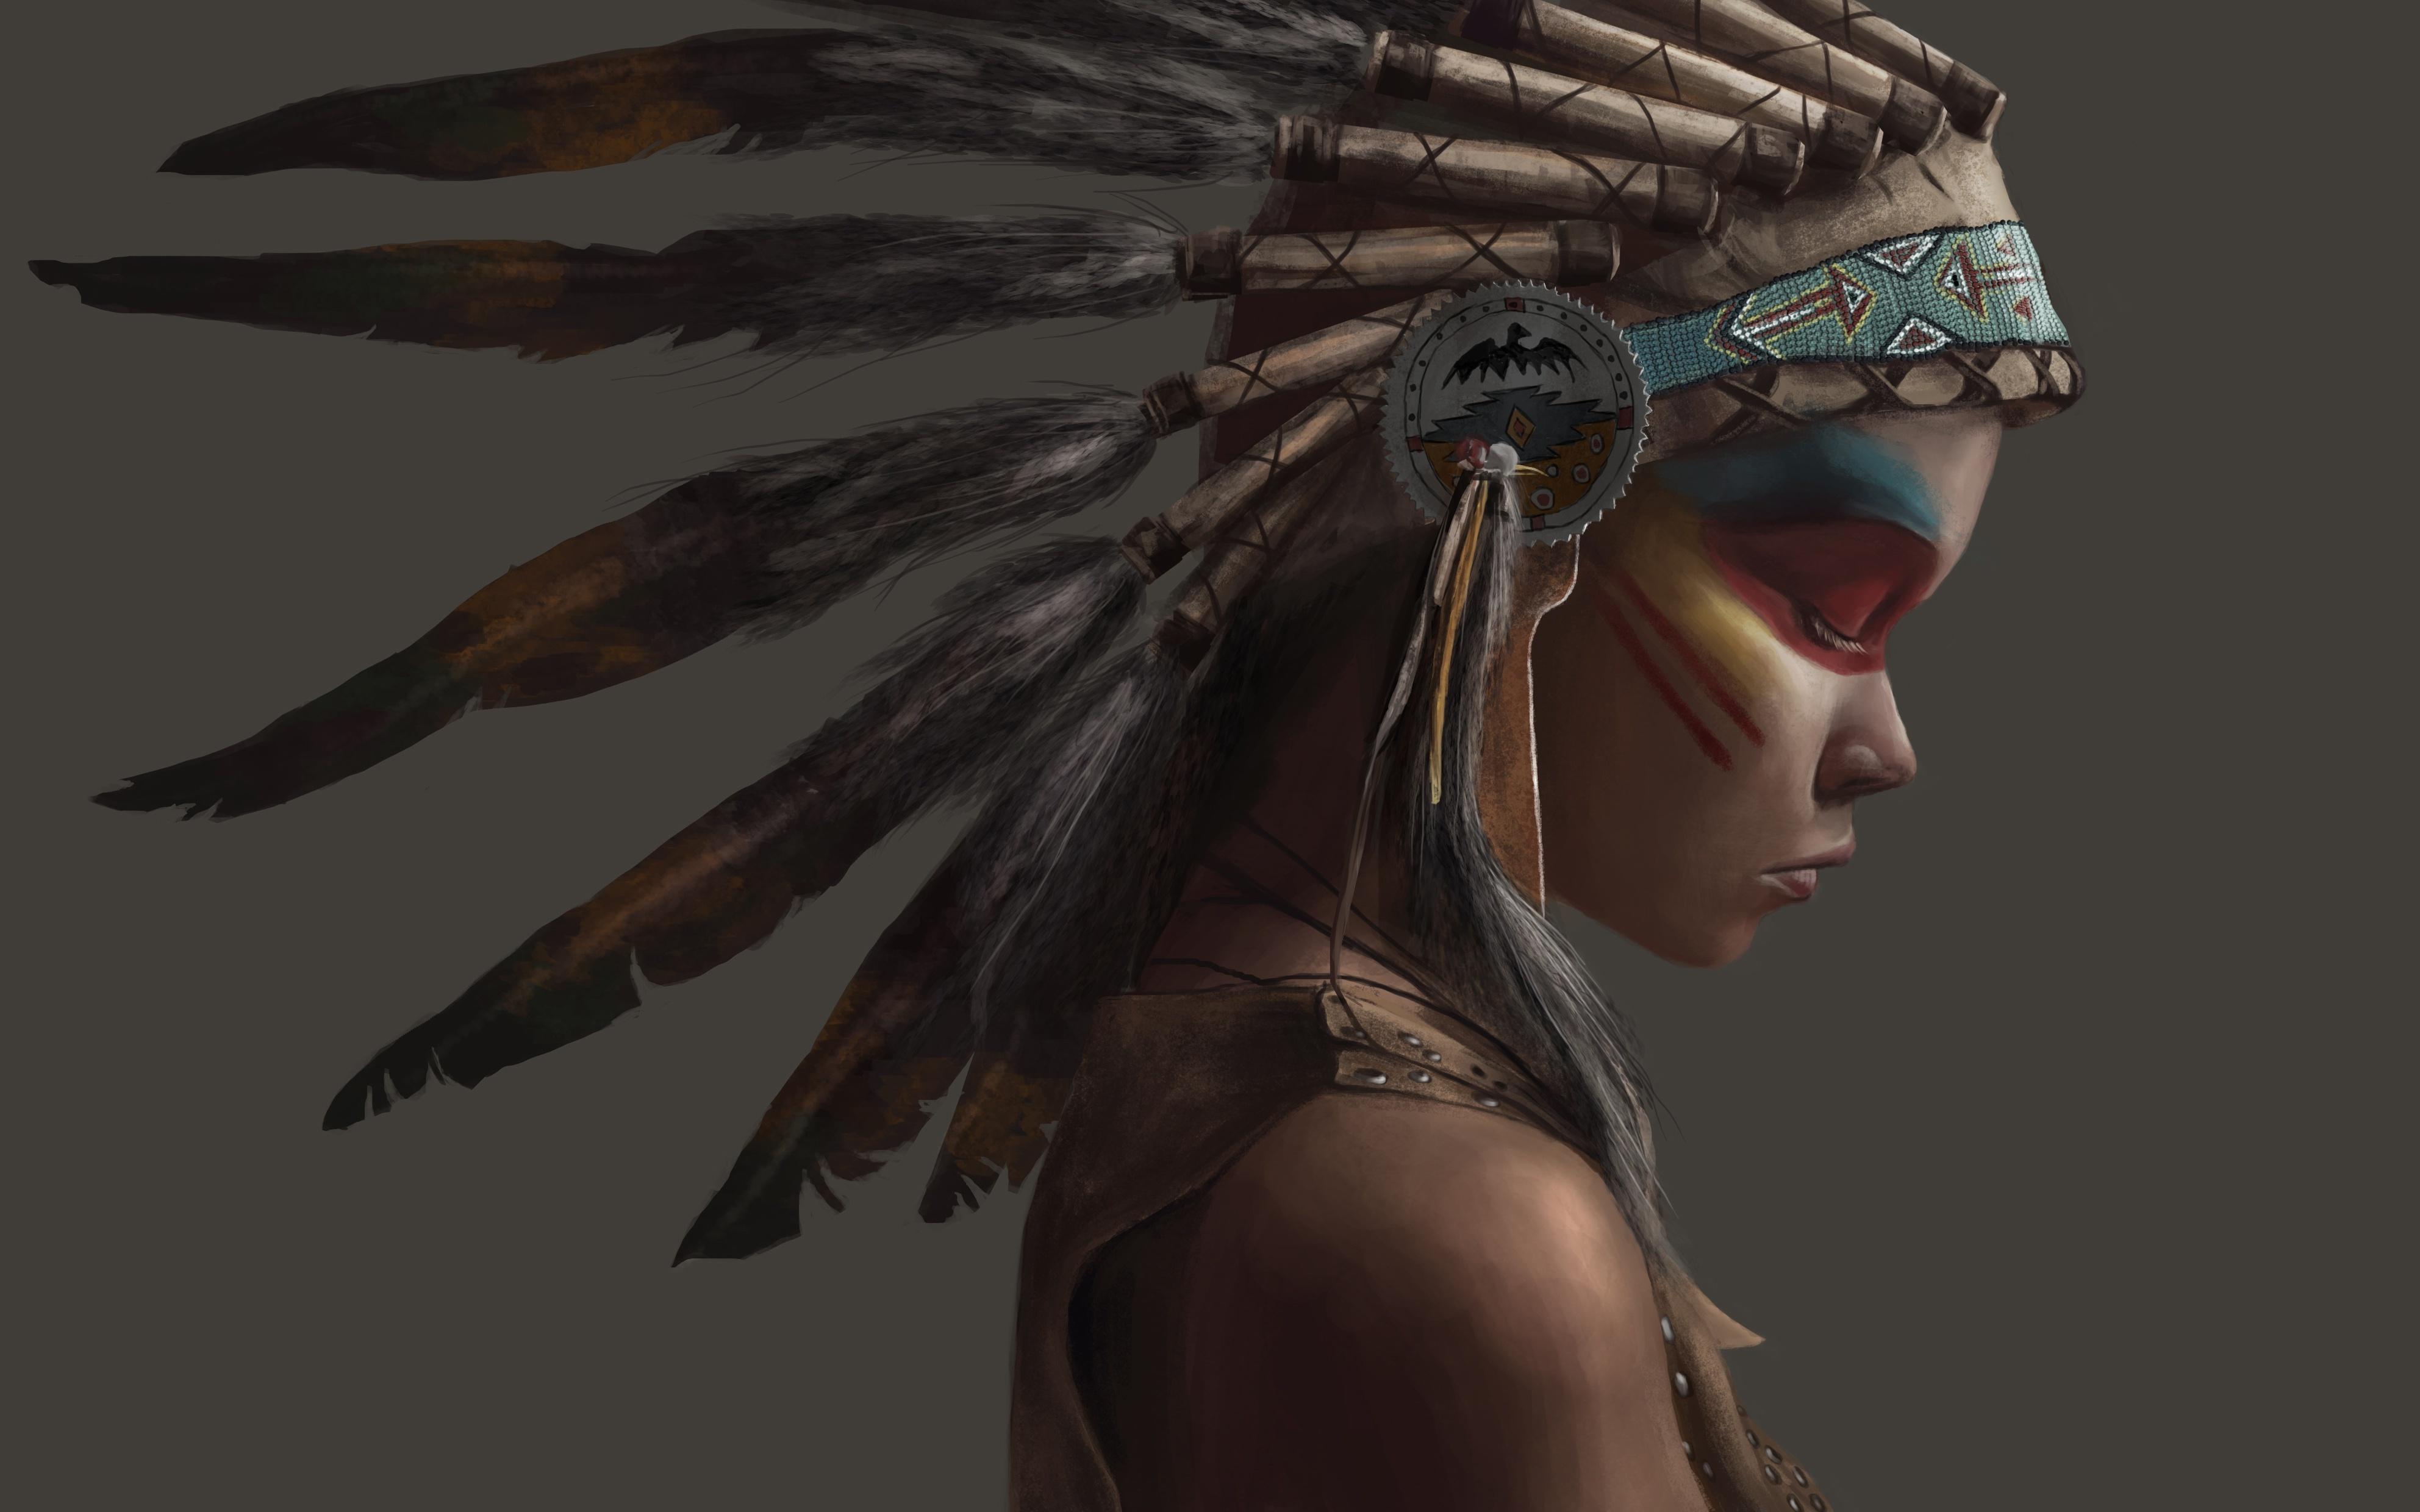 Wallpaper Artwork, Native America, Painting, Profile View ...